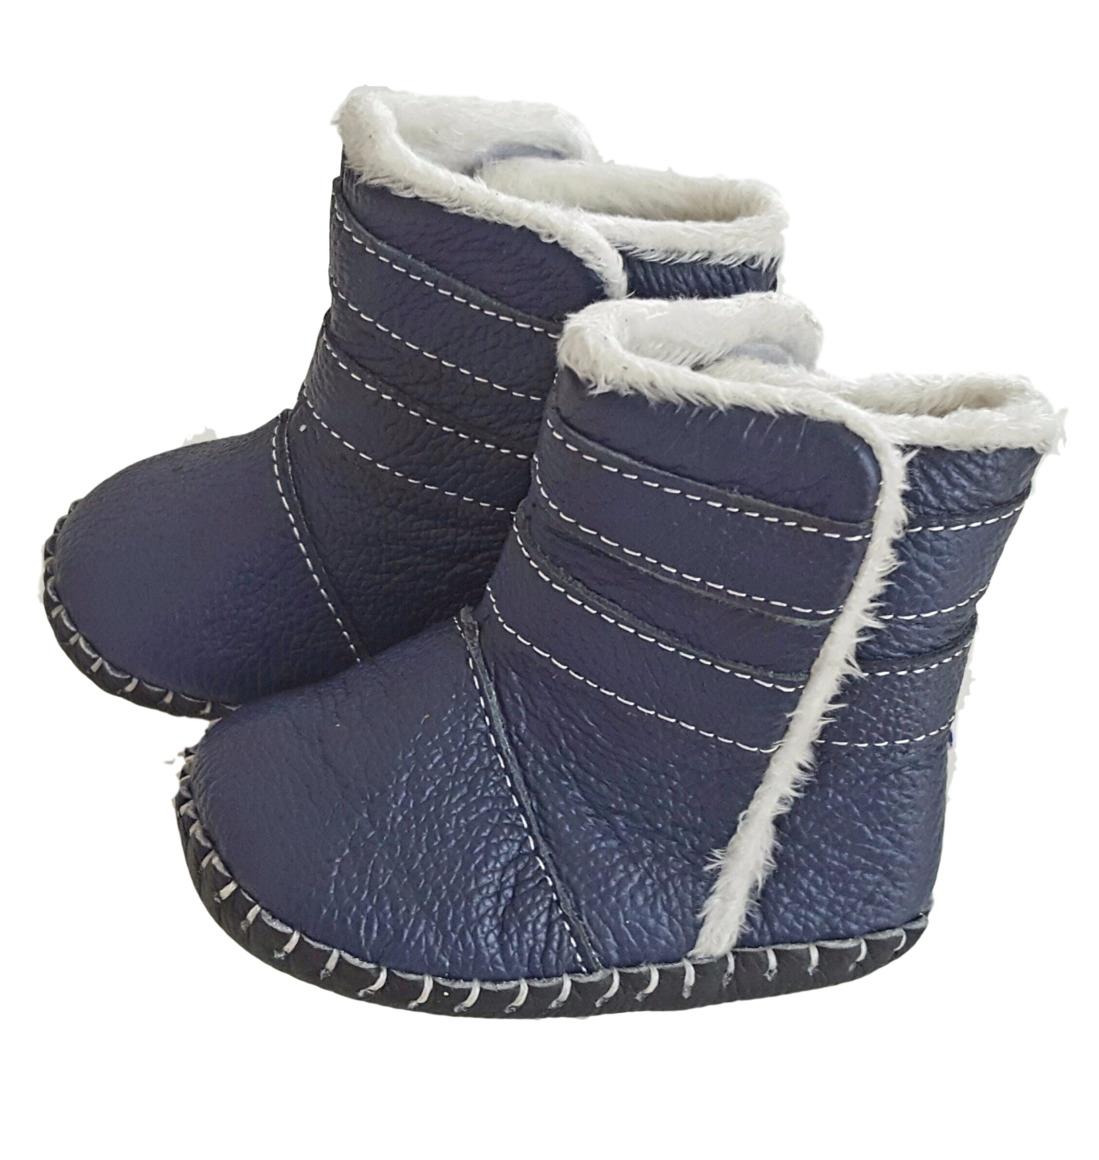 Navy Boots | Trada Marketplace